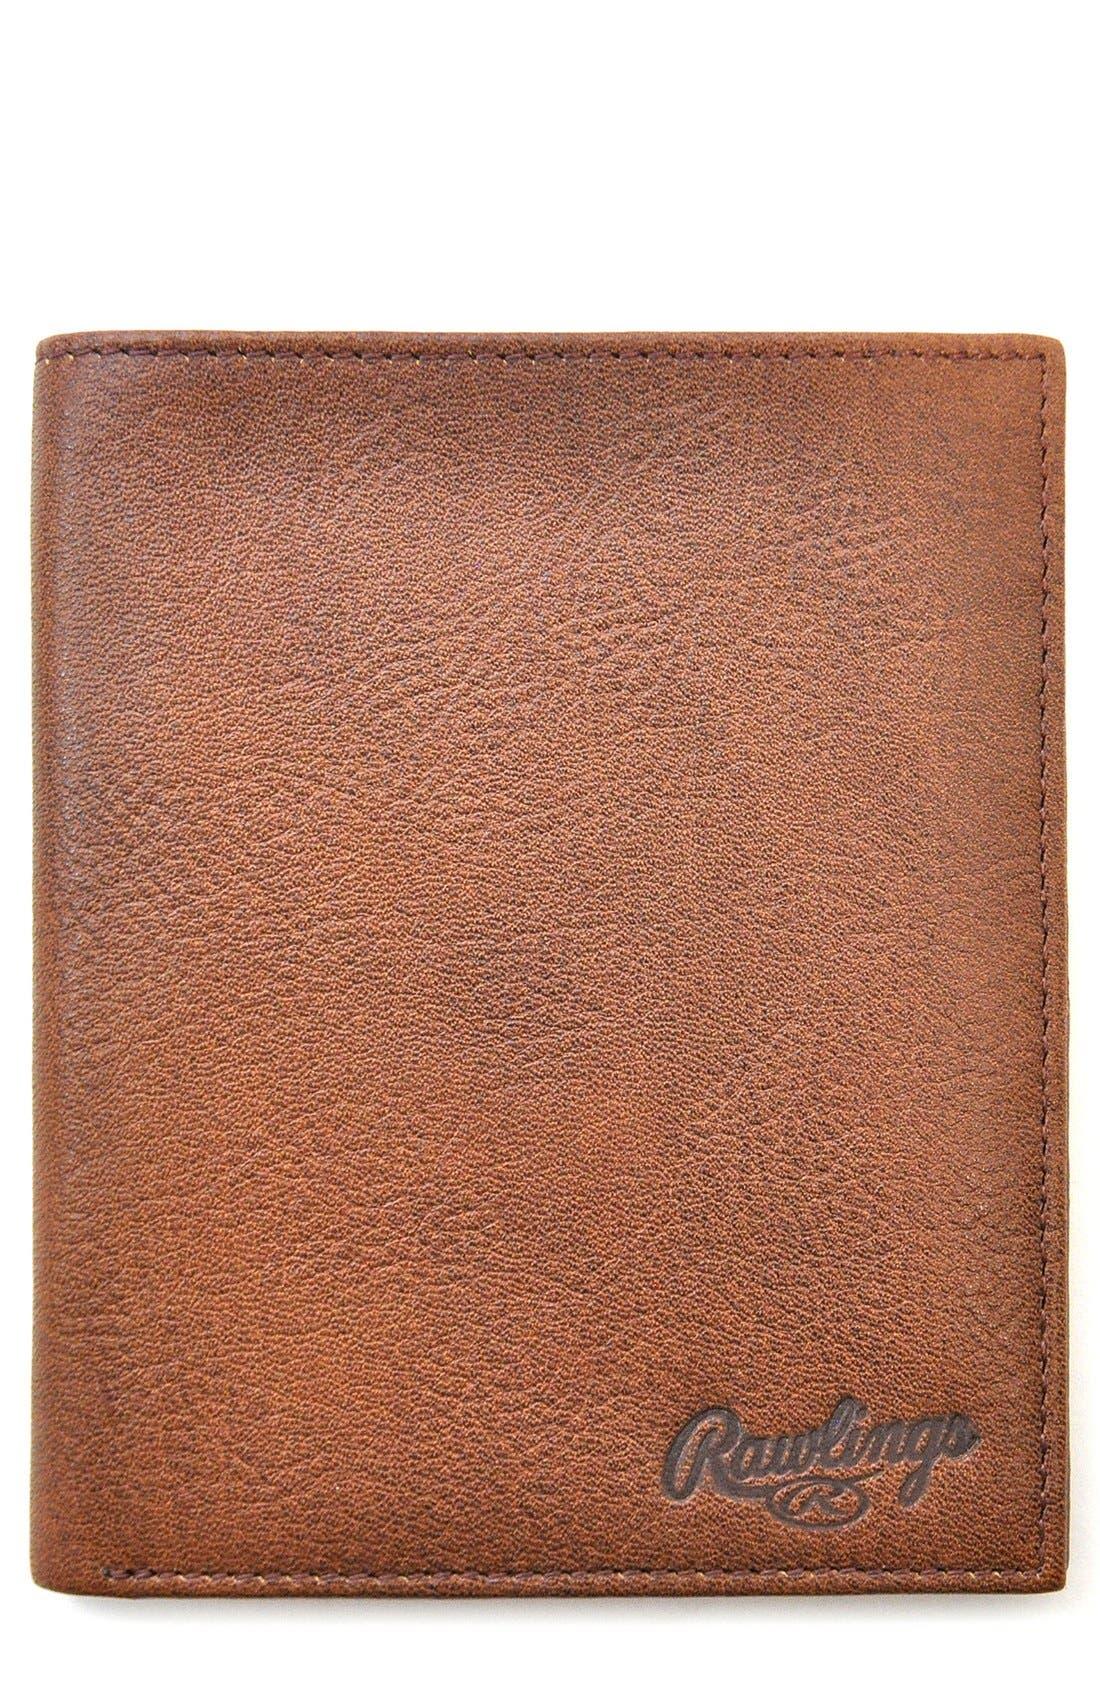 Triple Play Leather Executive Wallet,                             Main thumbnail 1, color,                             Cognac